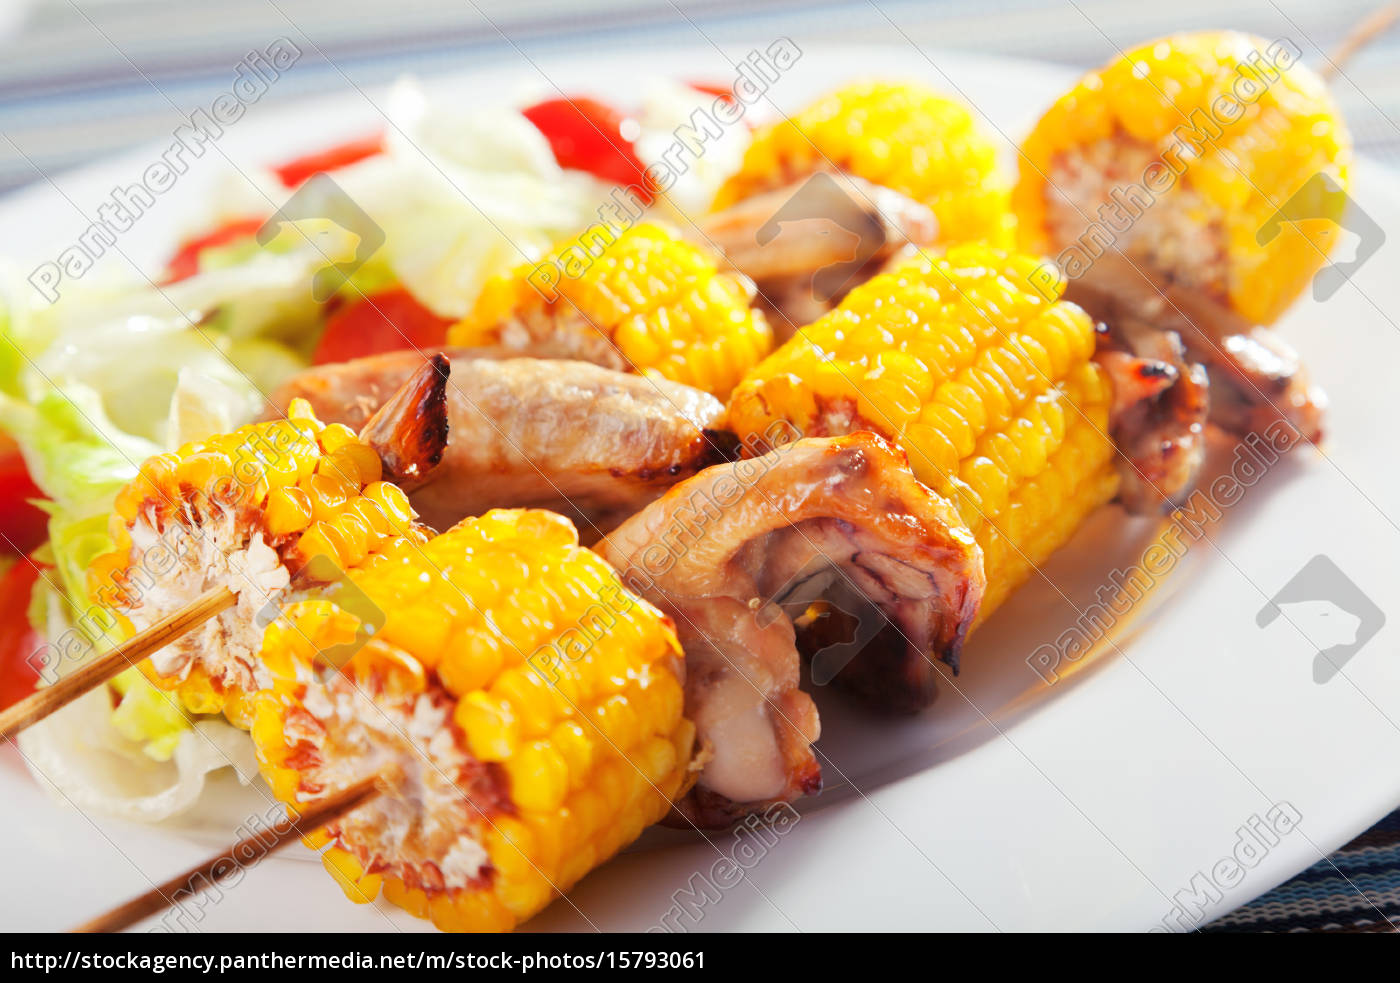 chicken, wings, with, corn, skewers, chicken, wings - 15793061